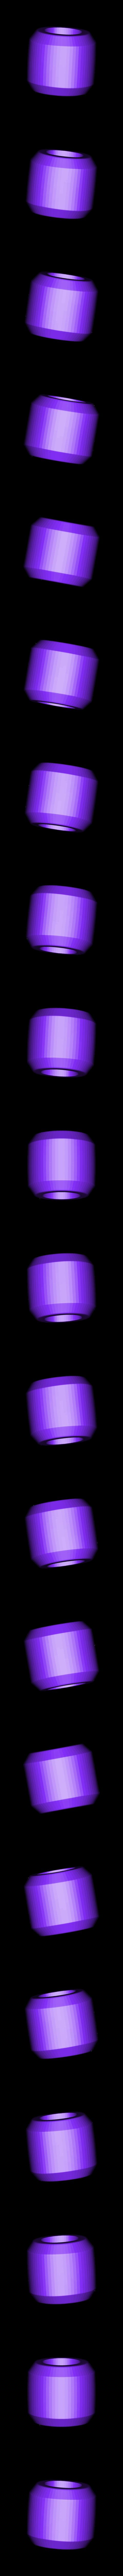 Lucio_hoseMntB.stl Download free STL file Overwatch Lucio Blaster • 3D printer object, Adafruit